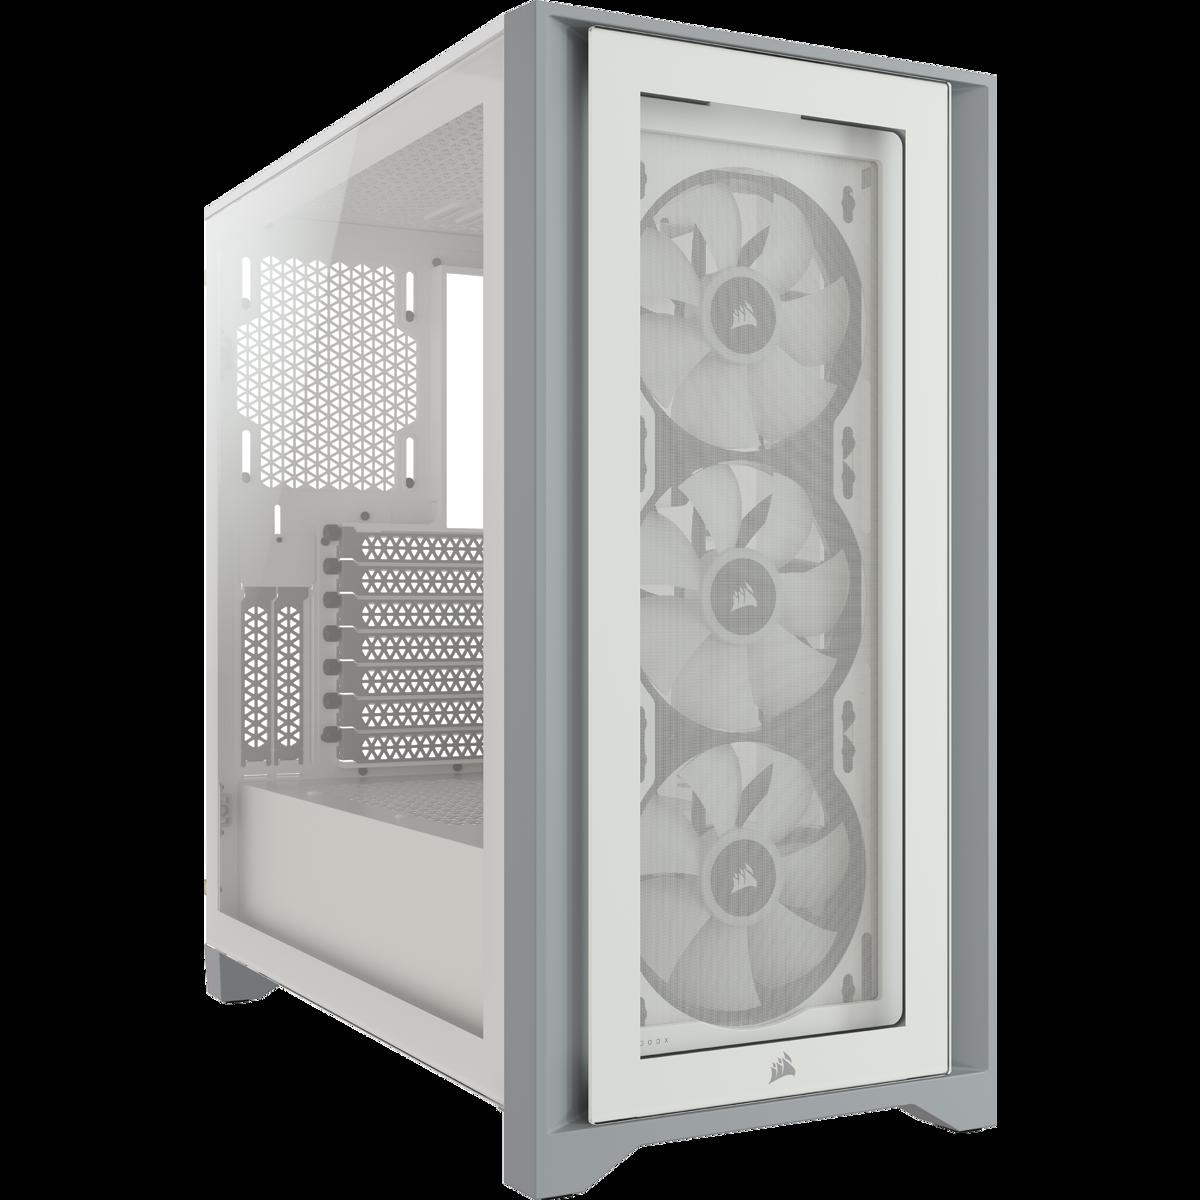 ICUE 4000X WHITE +3 FAN RGB - CORSAIR